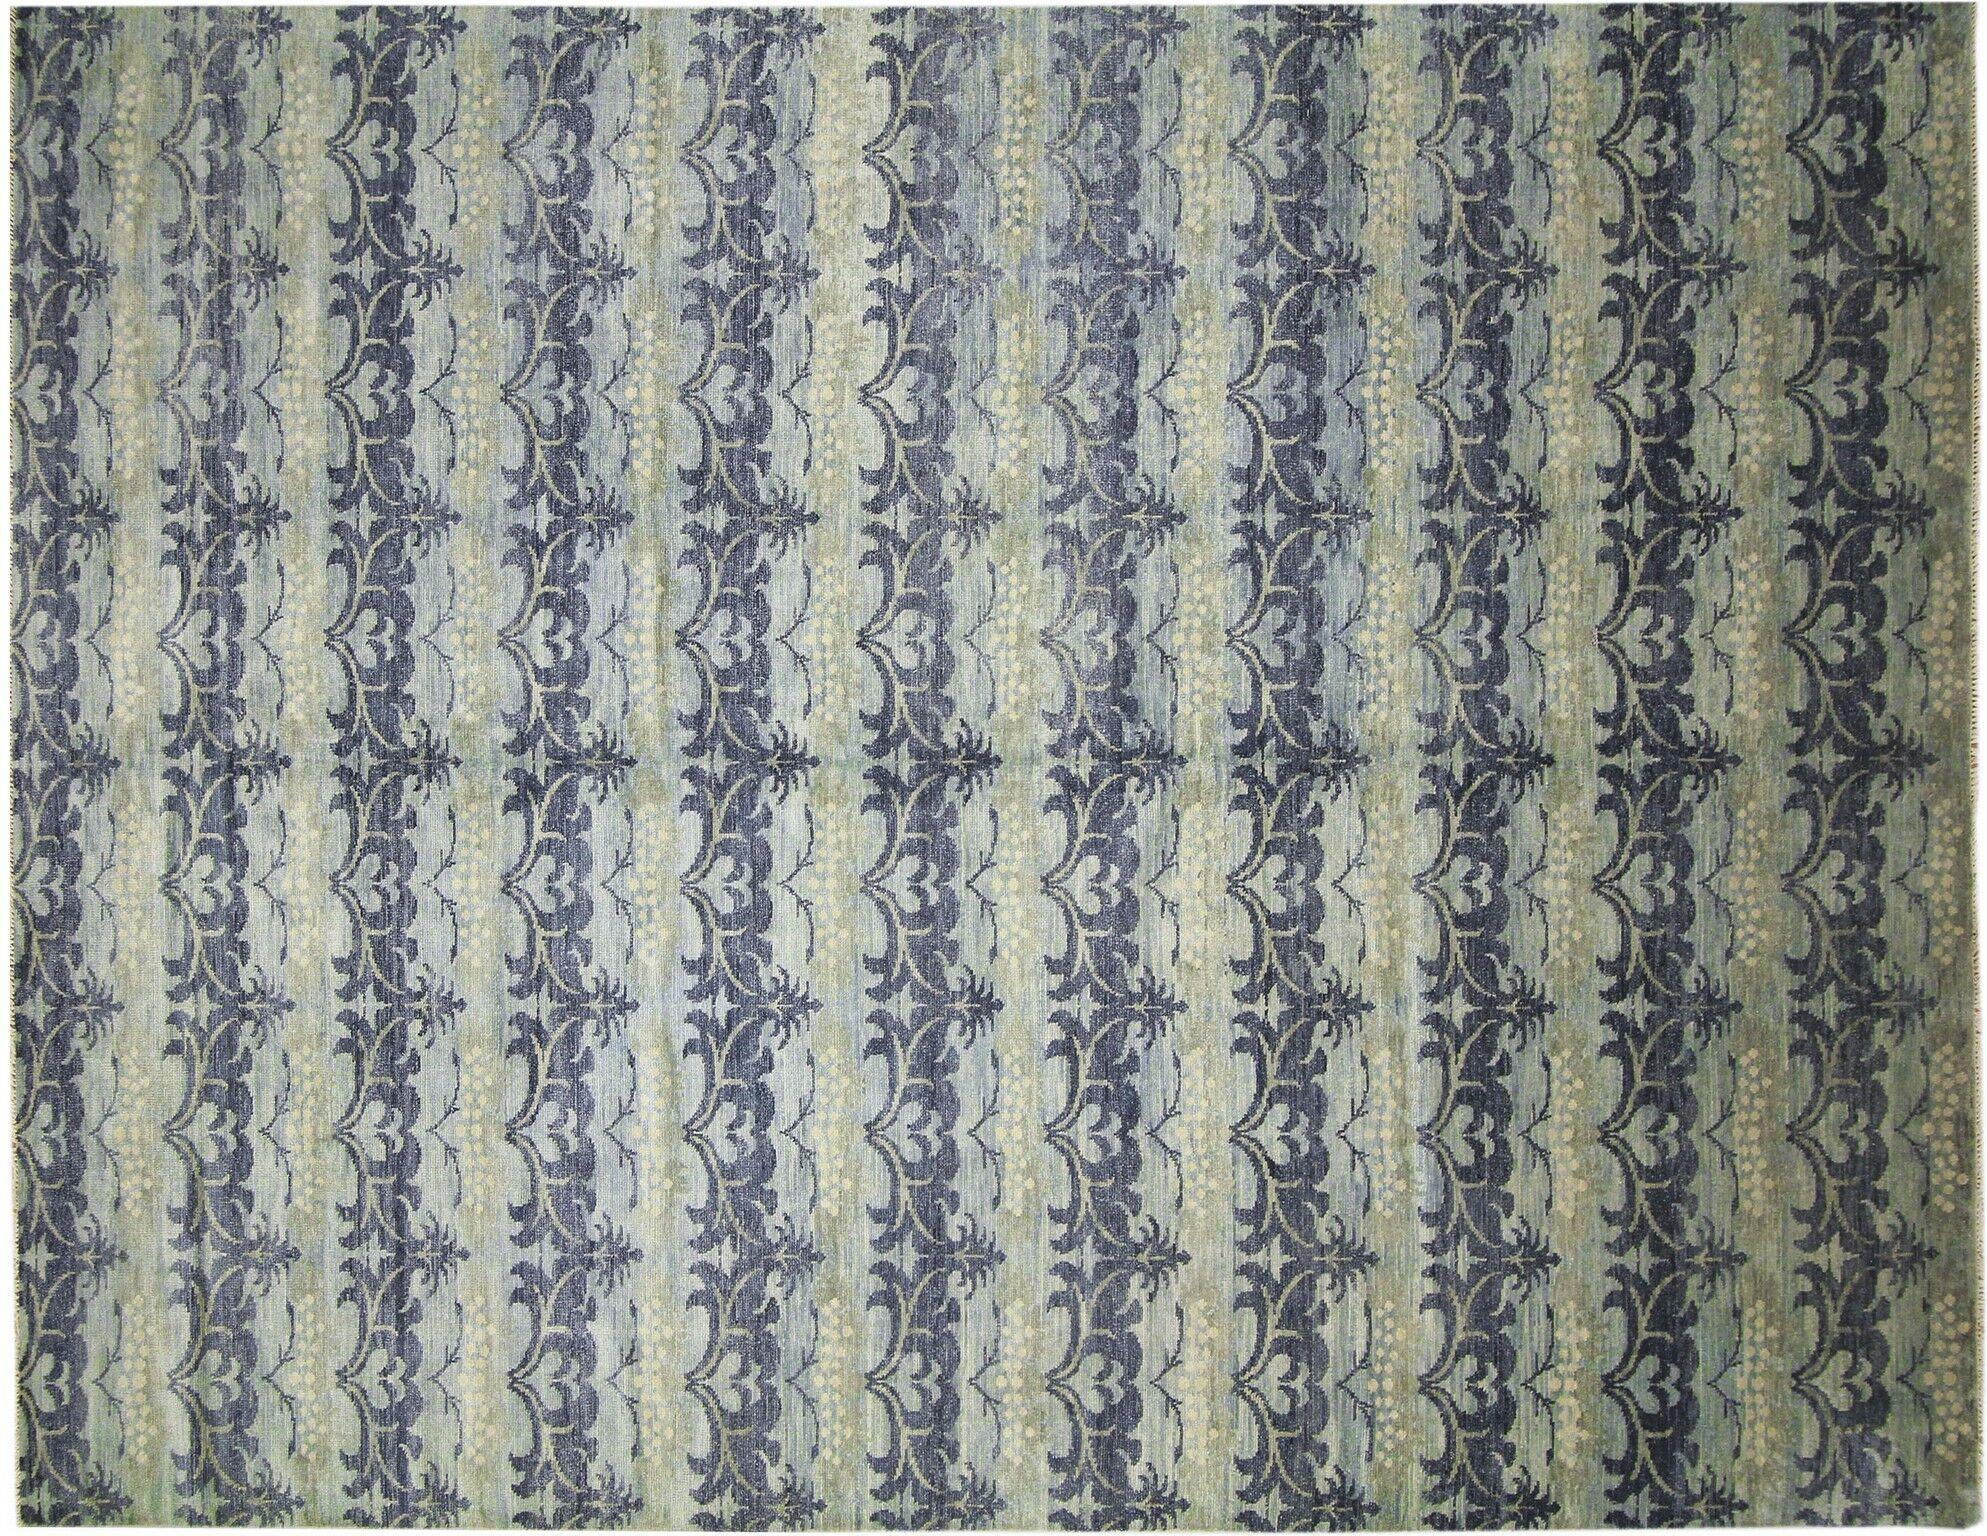 One-of-a-Kind Lona Loom Hand-Knotted Rectangle Light Blue Area Rug